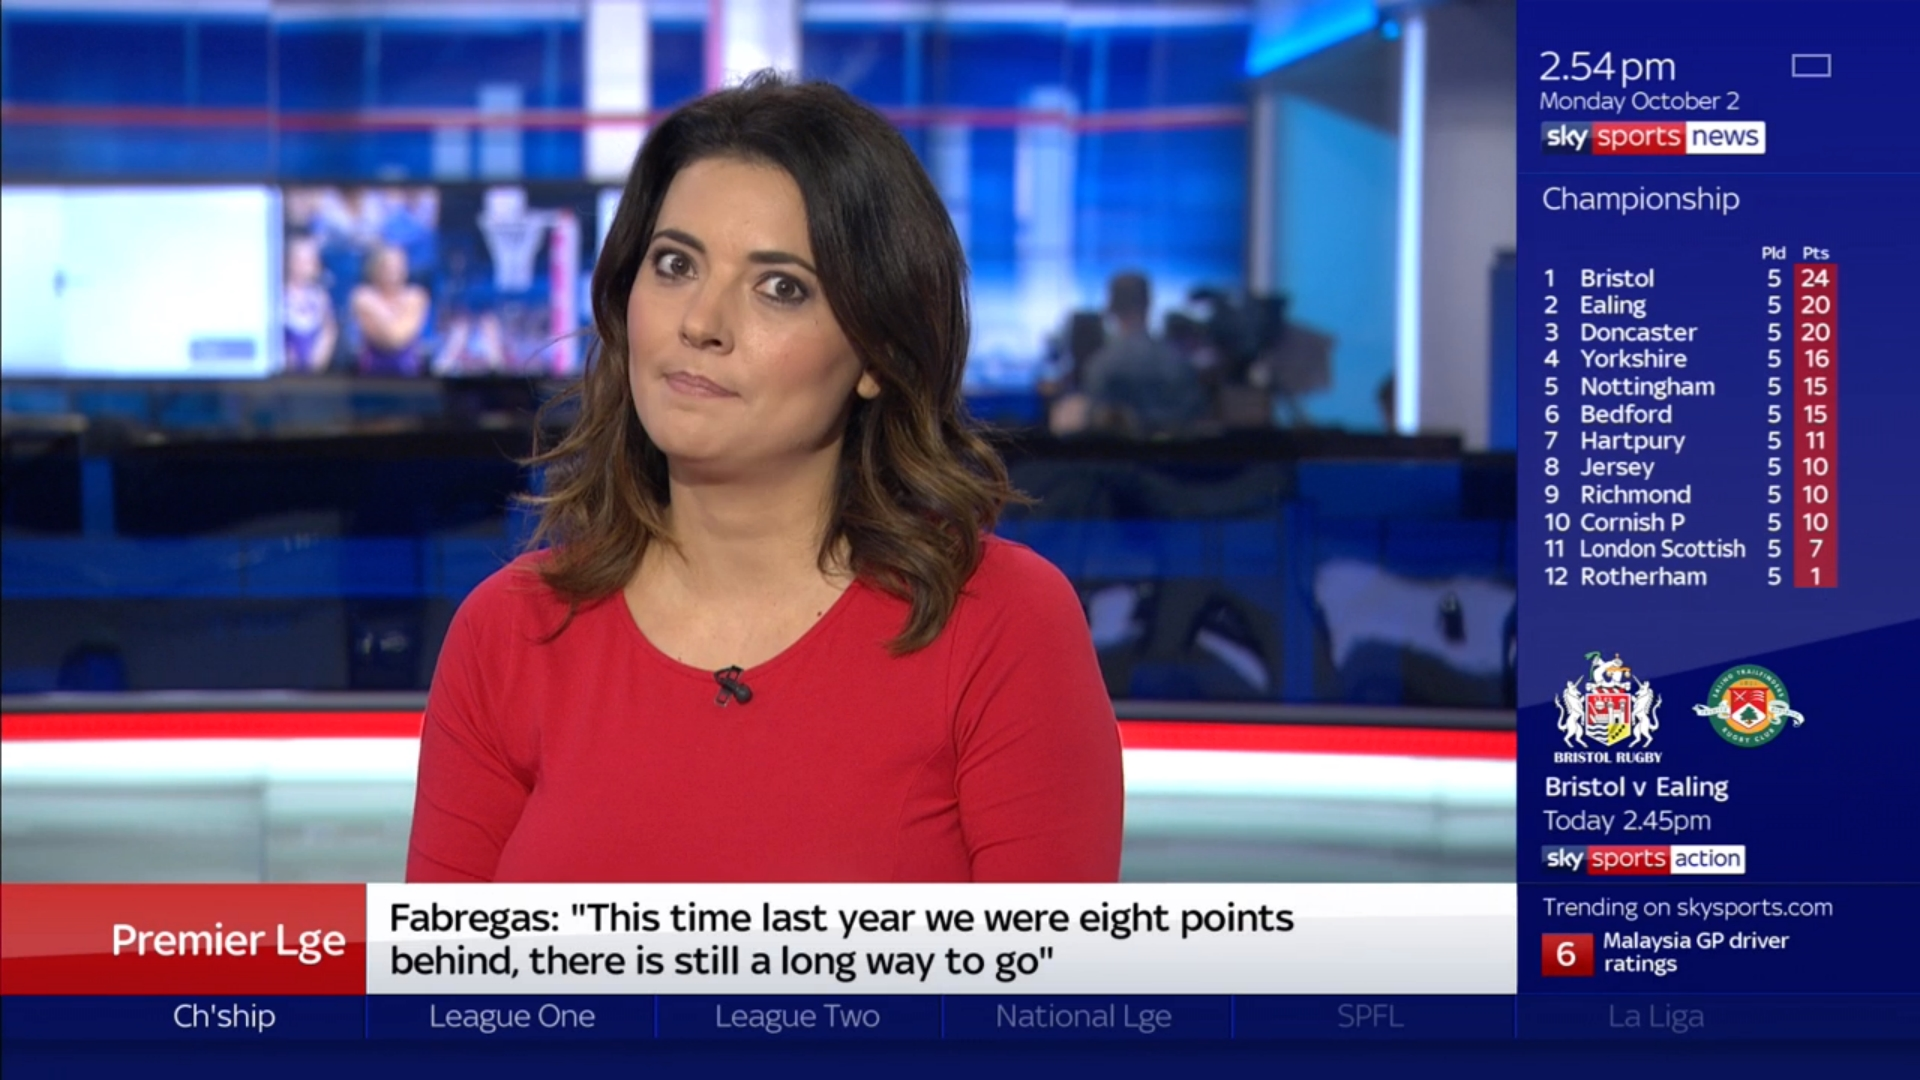 Natalie Sawyer - Sky Sports News Presenter (2)